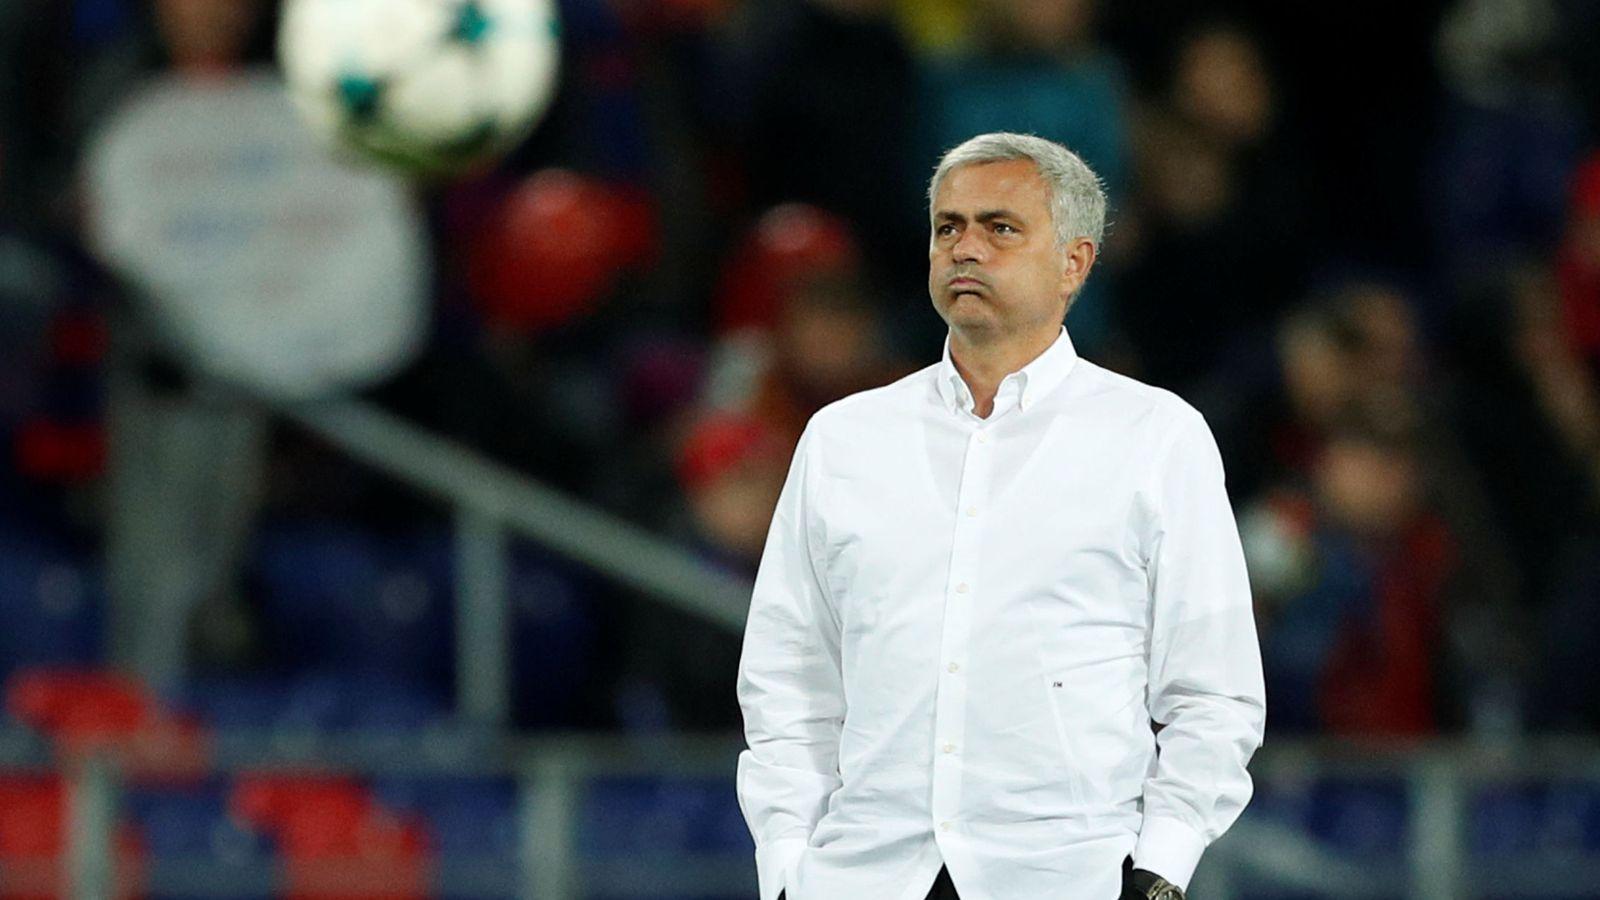 Foto: Jose Mourinho es ahora entrenador del Manchester United. (Reuters)